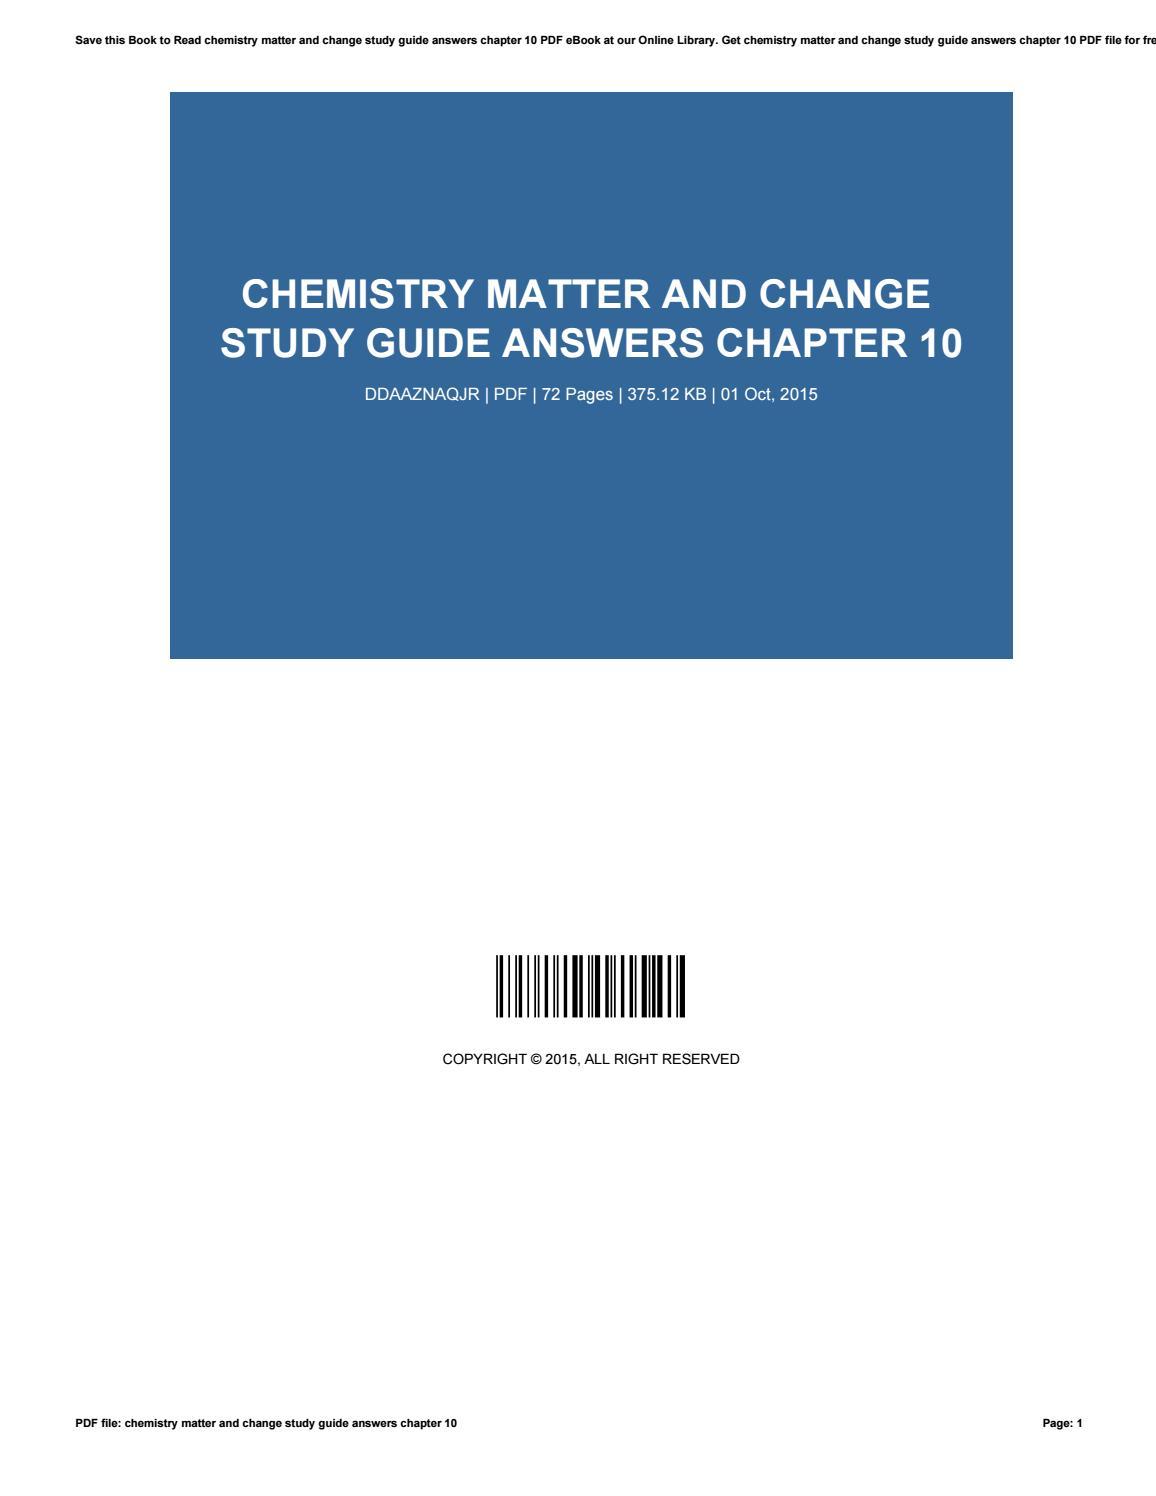 Glencoe Chemistry Matter And Change Study Guide Answer Key